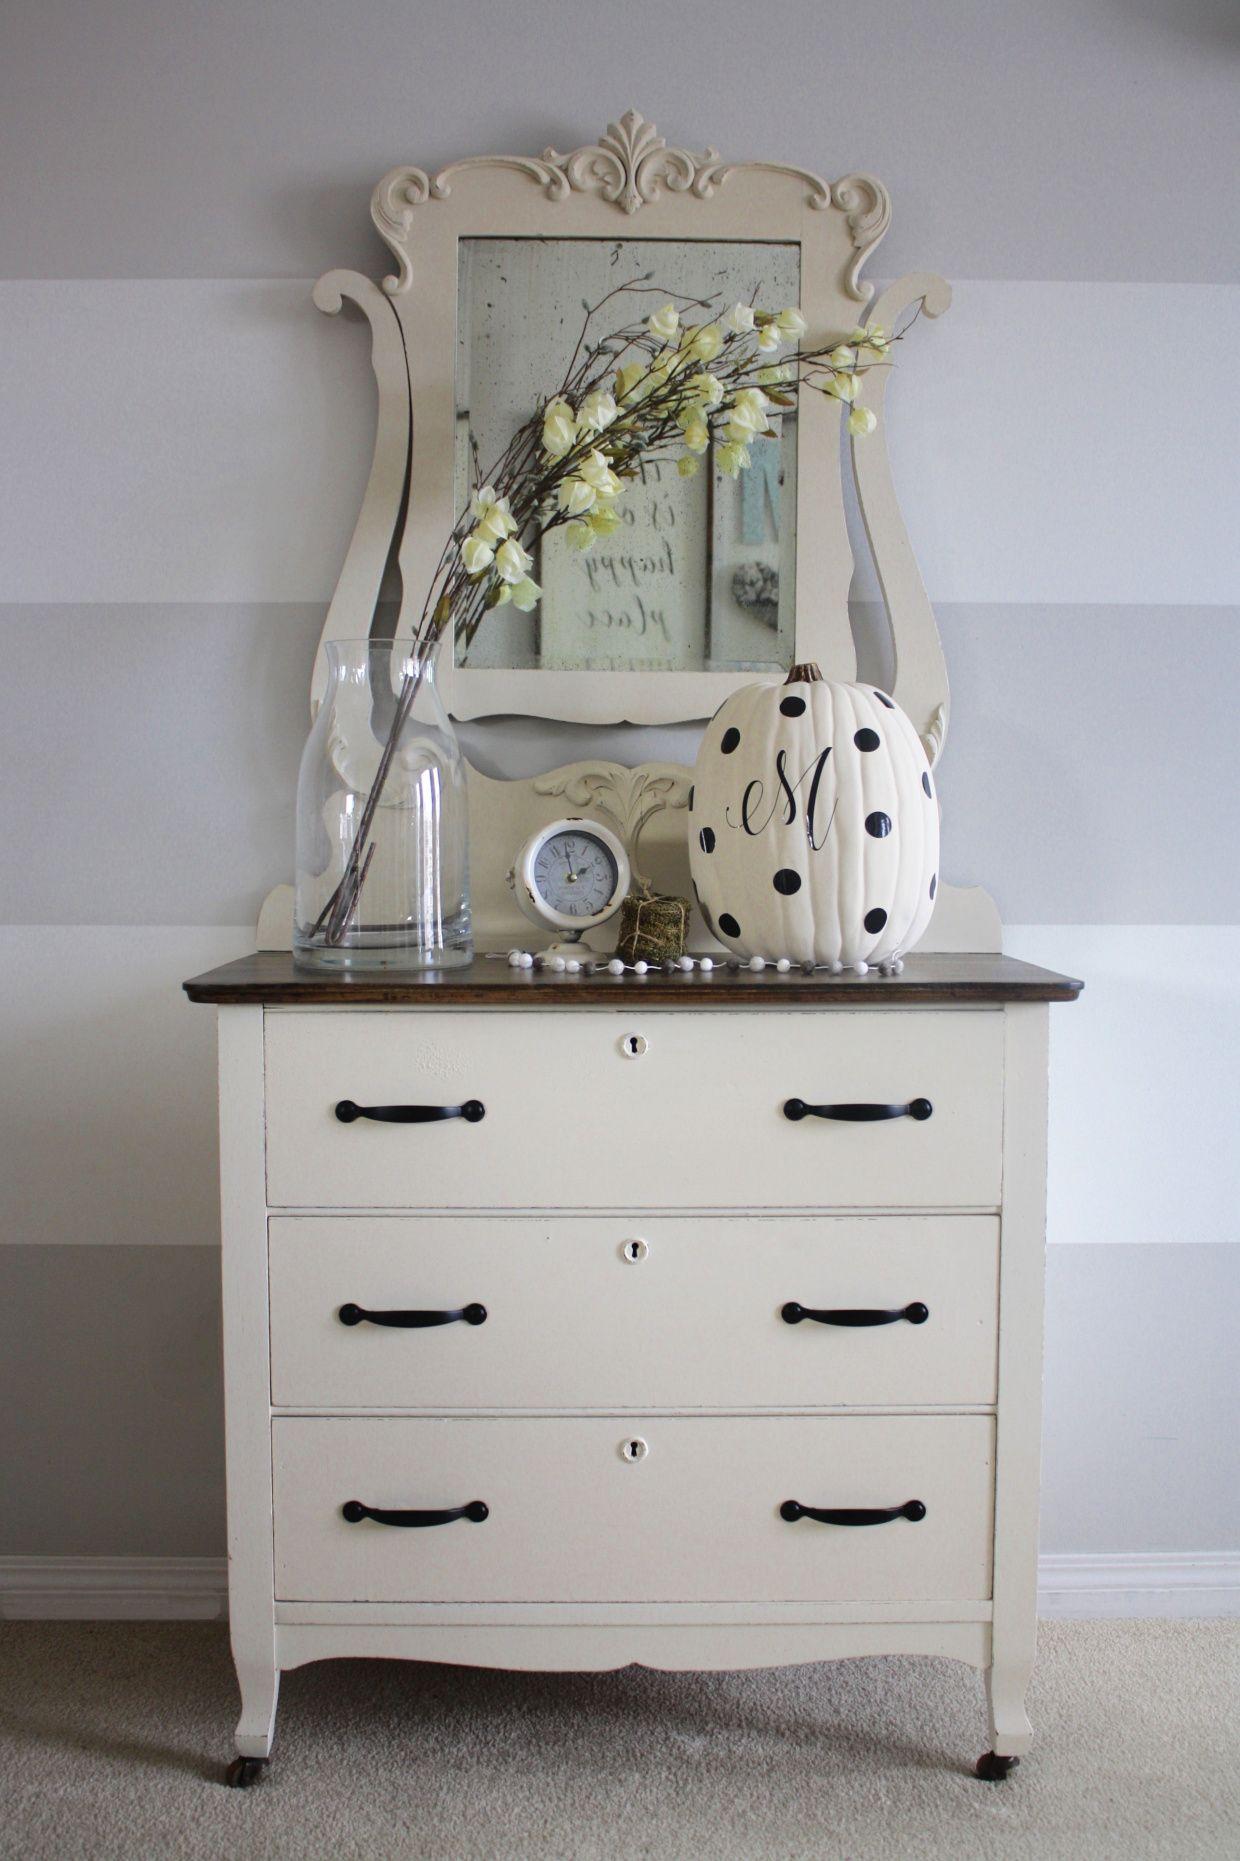 Cheesecake Dresser Country Chic Paint Shabby Chic Furniture Chic Furniture